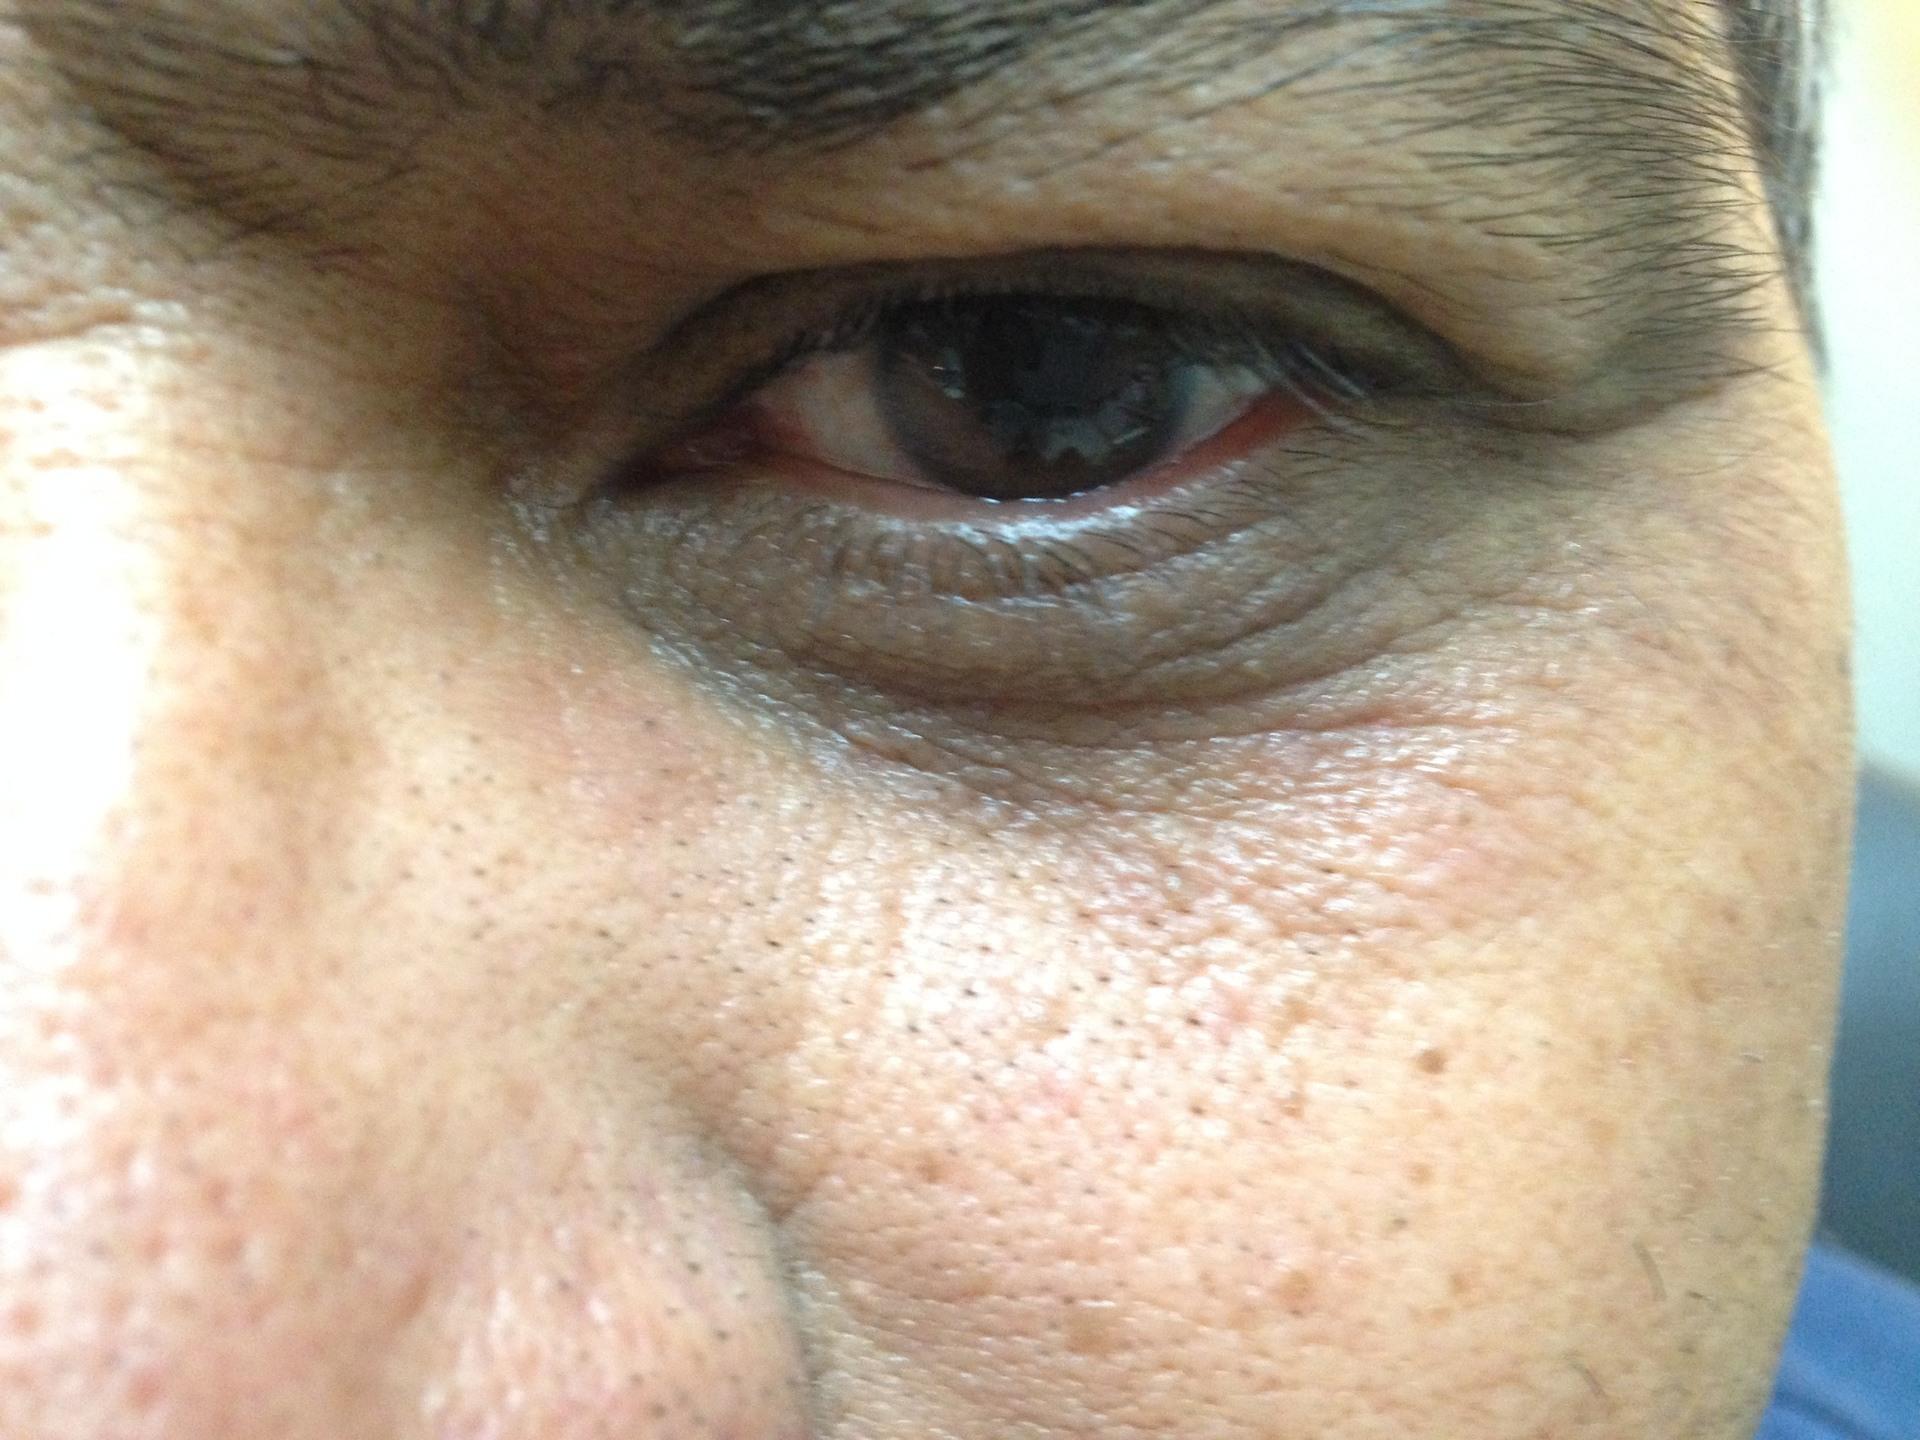 Eyelid needing surgery